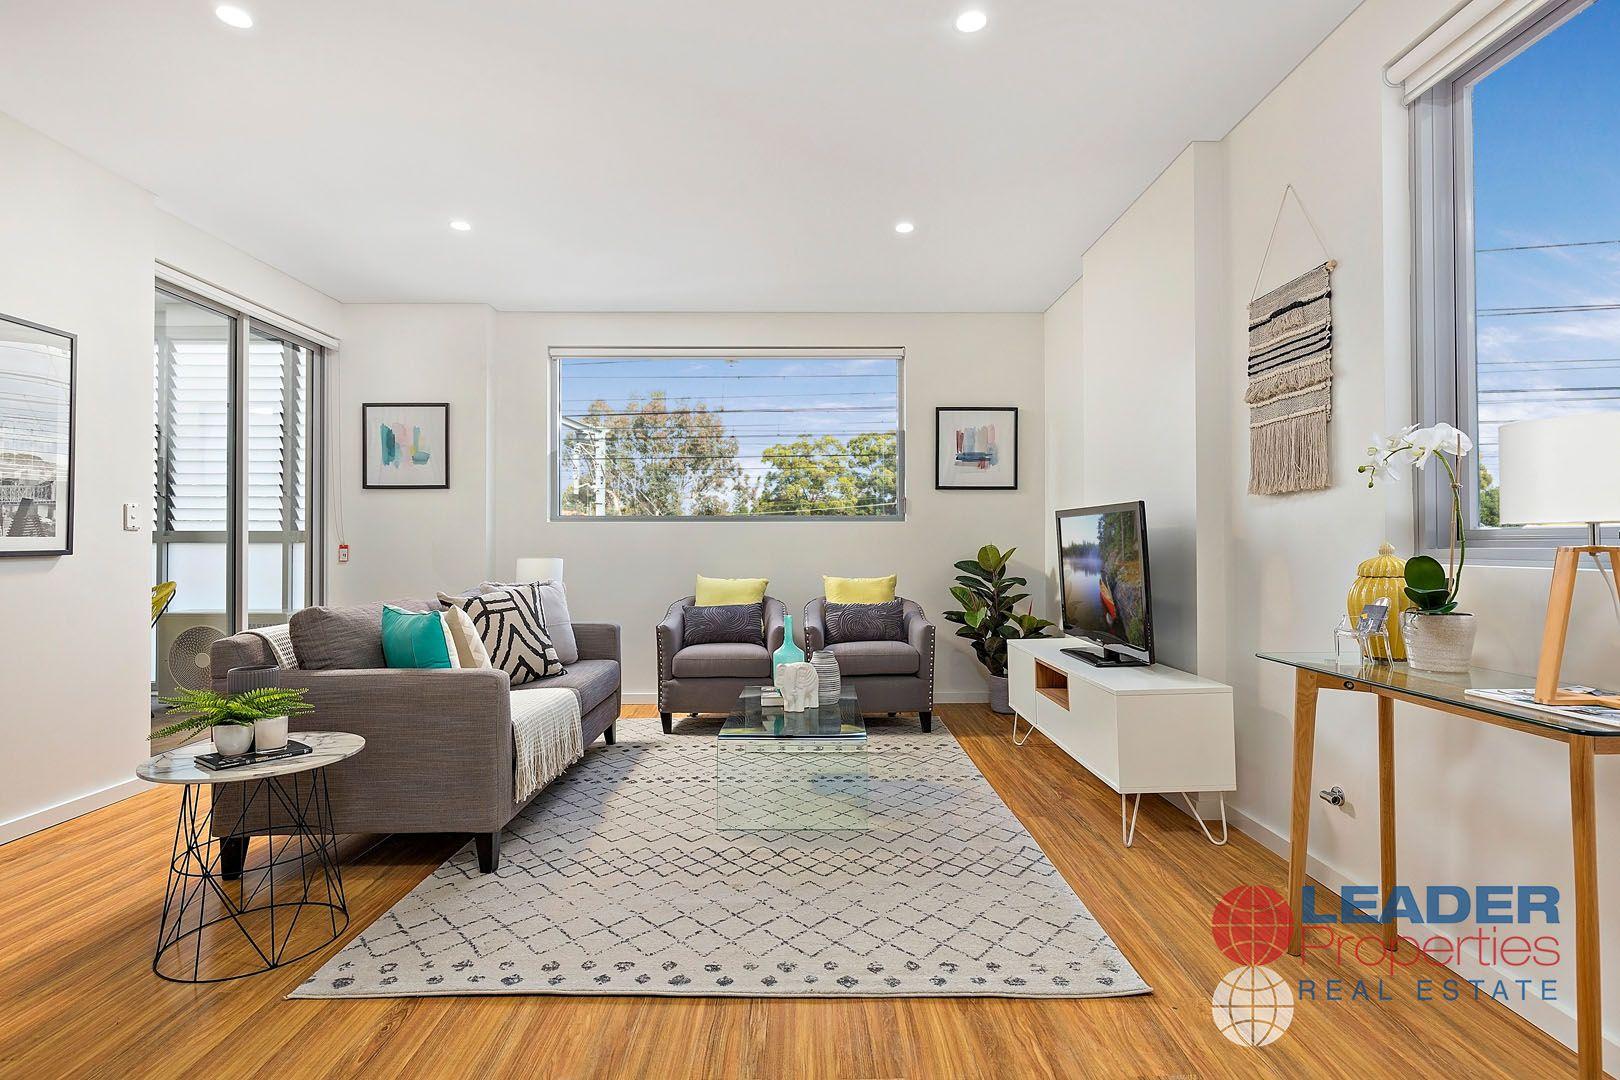 1 Bed/22-24 Grosvenor Street, Croydon NSW 2132, Image 0